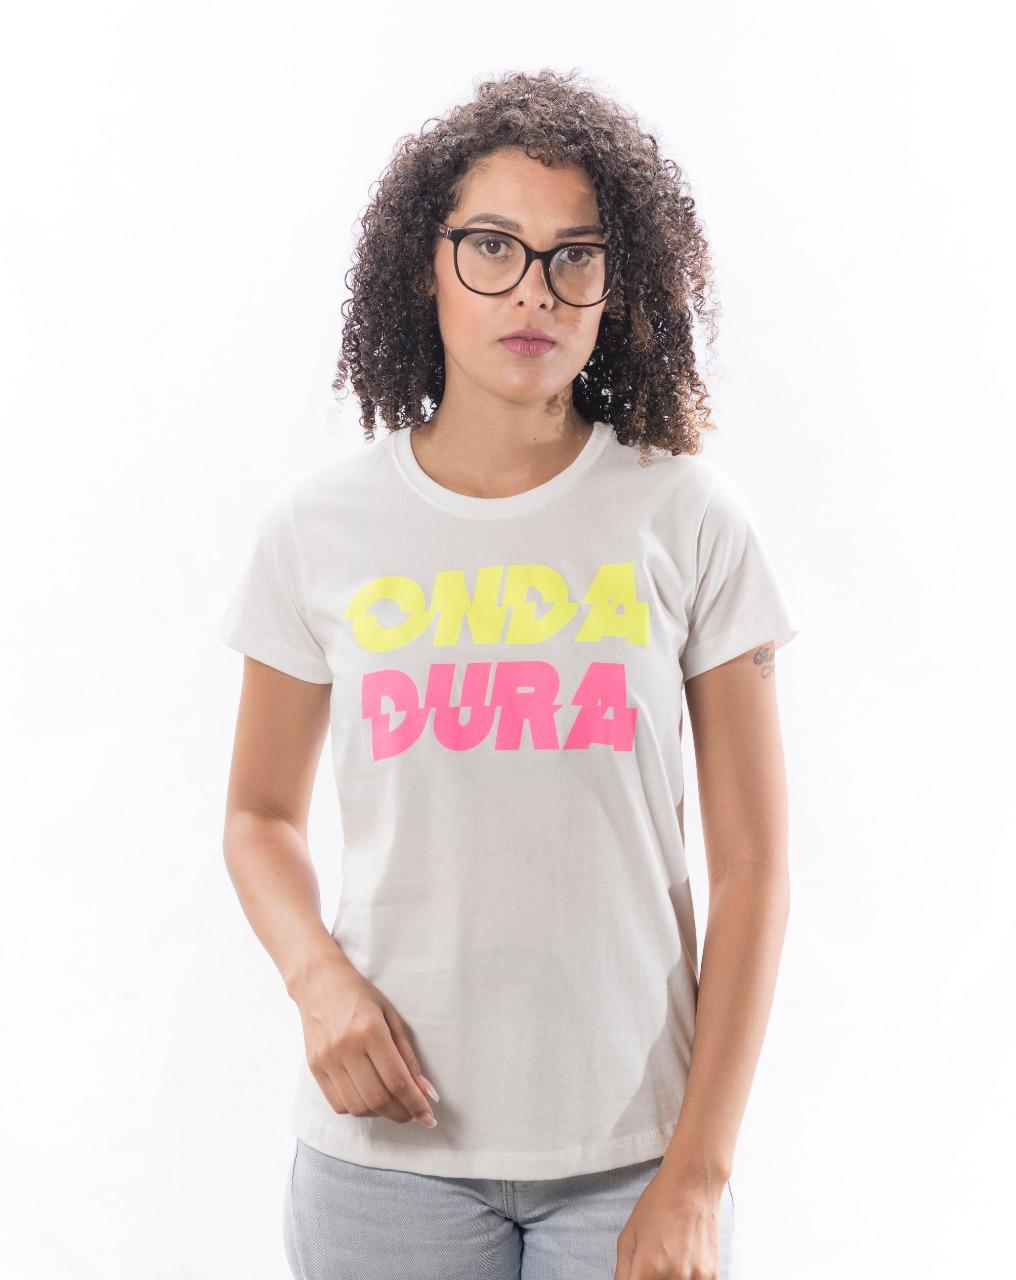 Babylook branca Onda Dura duo neon rosa e amarelo